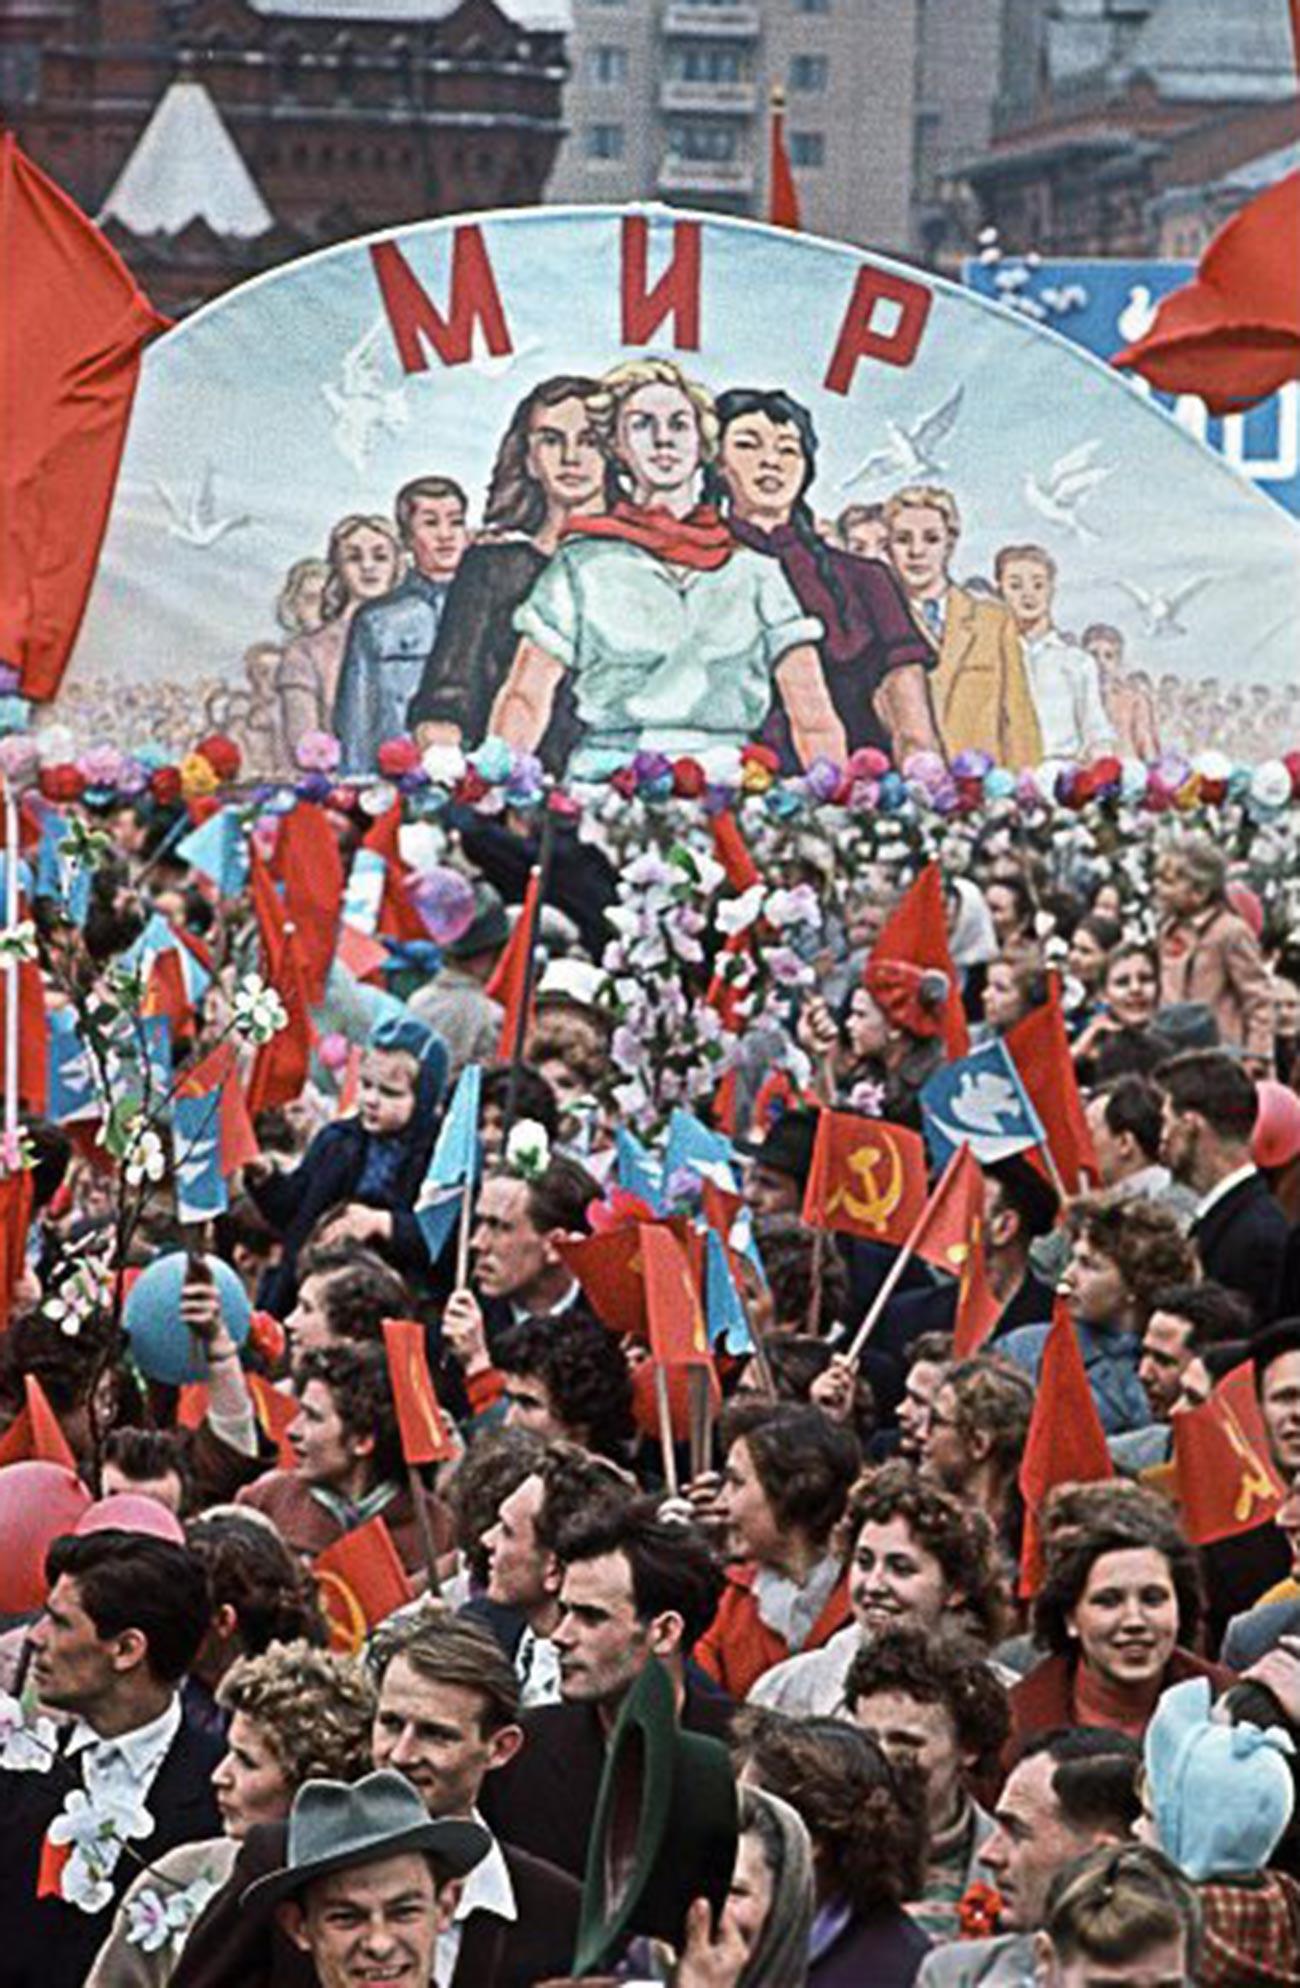 «Paix». Moscou festive, 1960